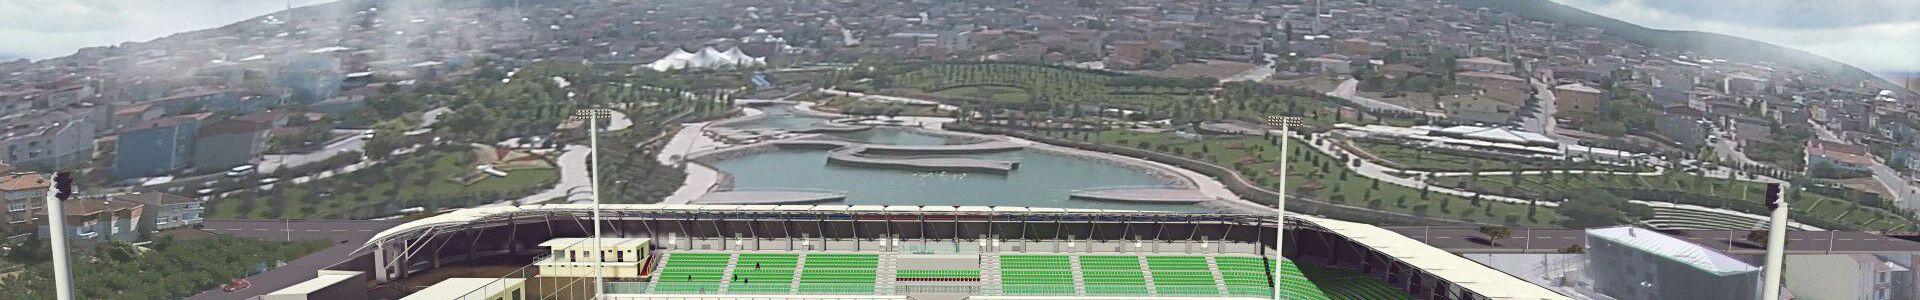 Sultanbeyli Stadı